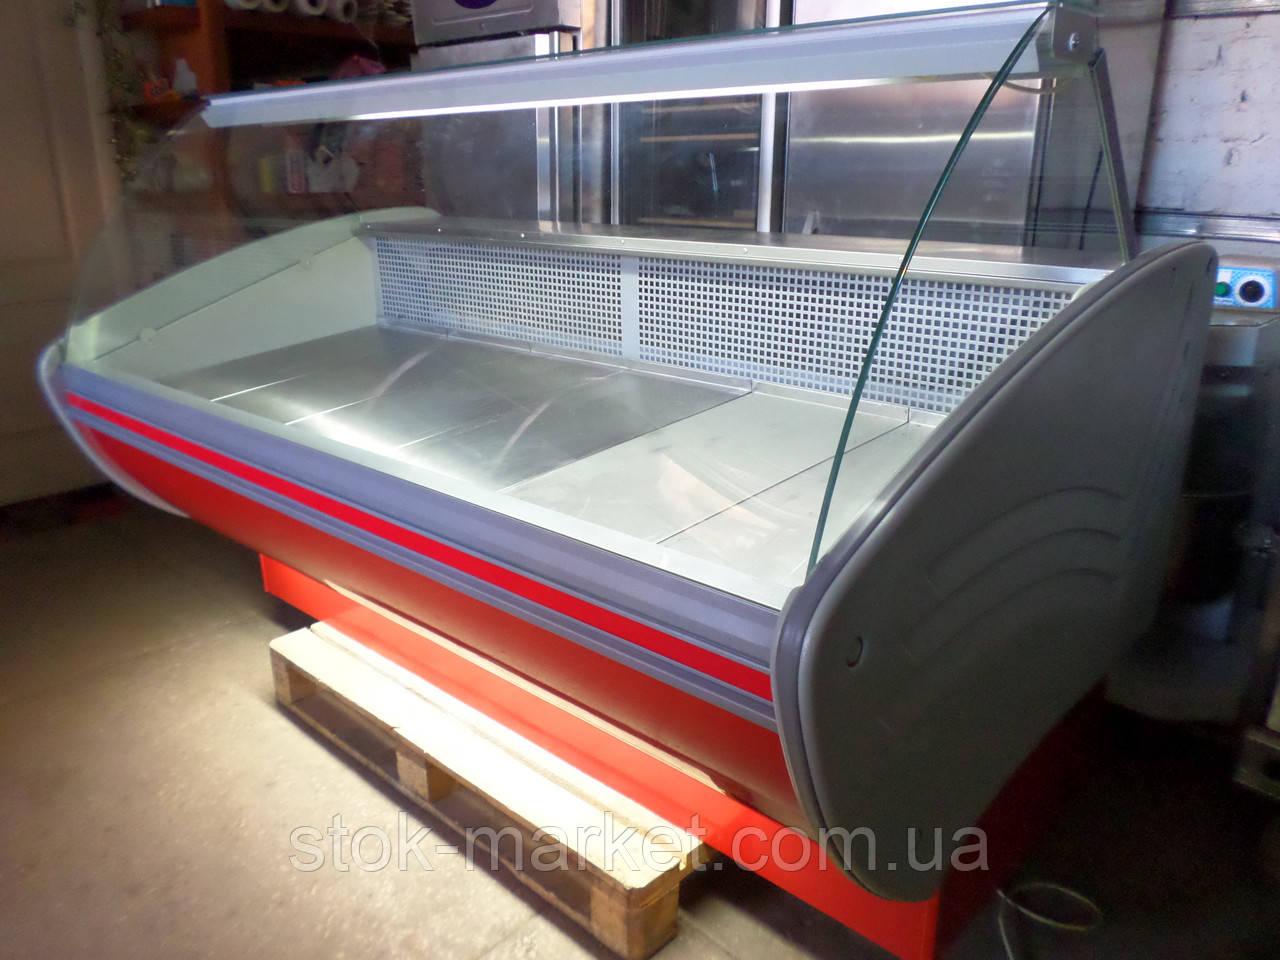 Холодильная витрина Каролина 2.0м Технохолод